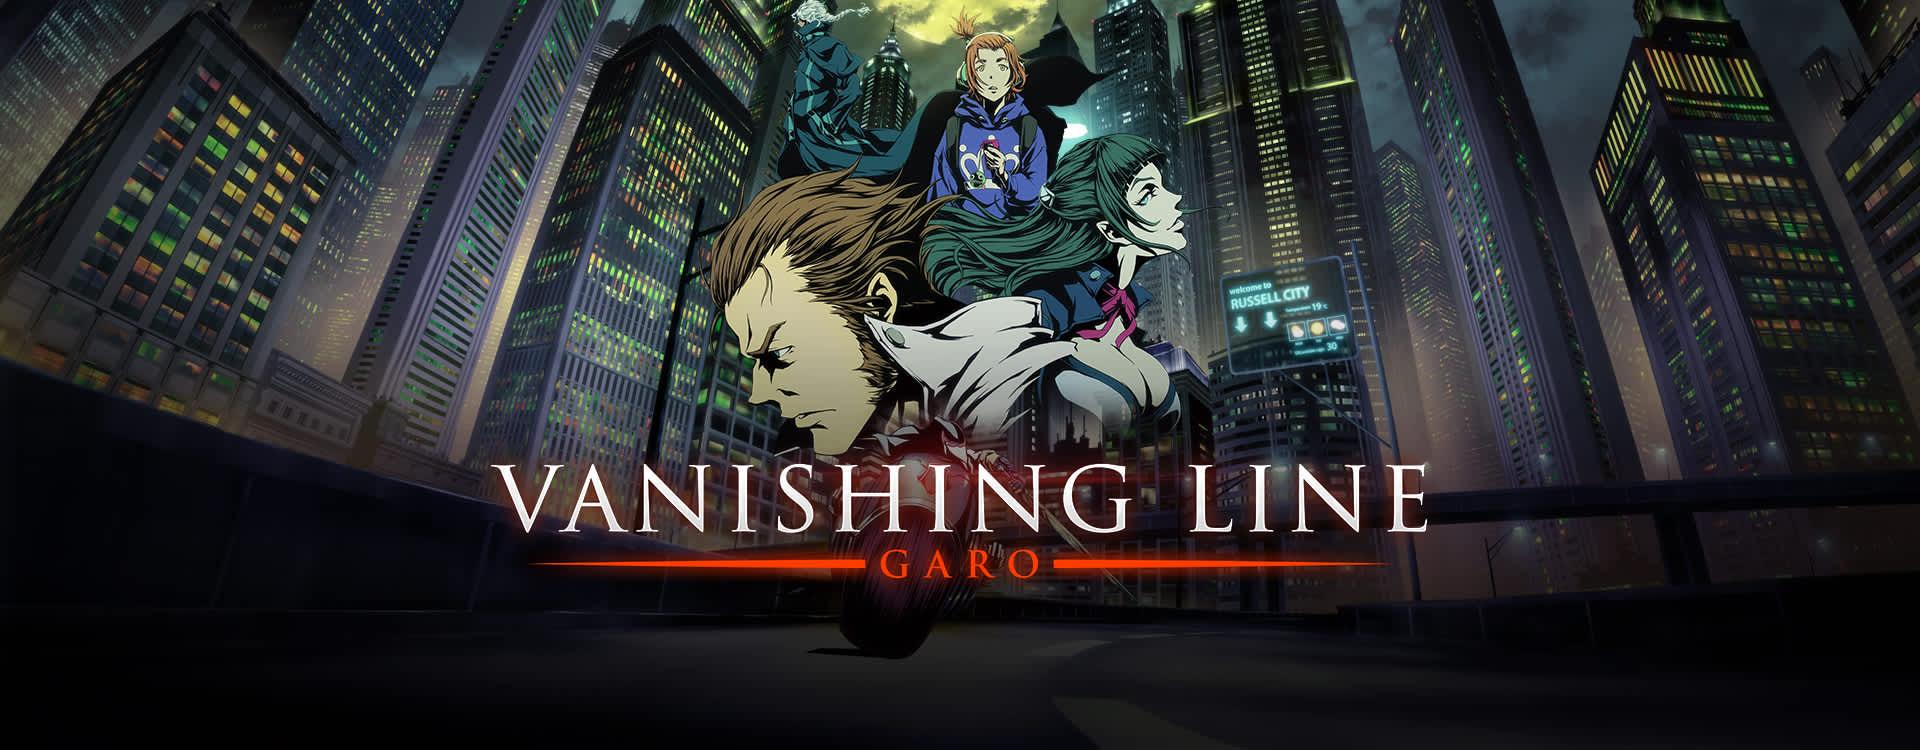 Garo: Vanishing Line - Garo: Vanishing Line, Vanishing Line